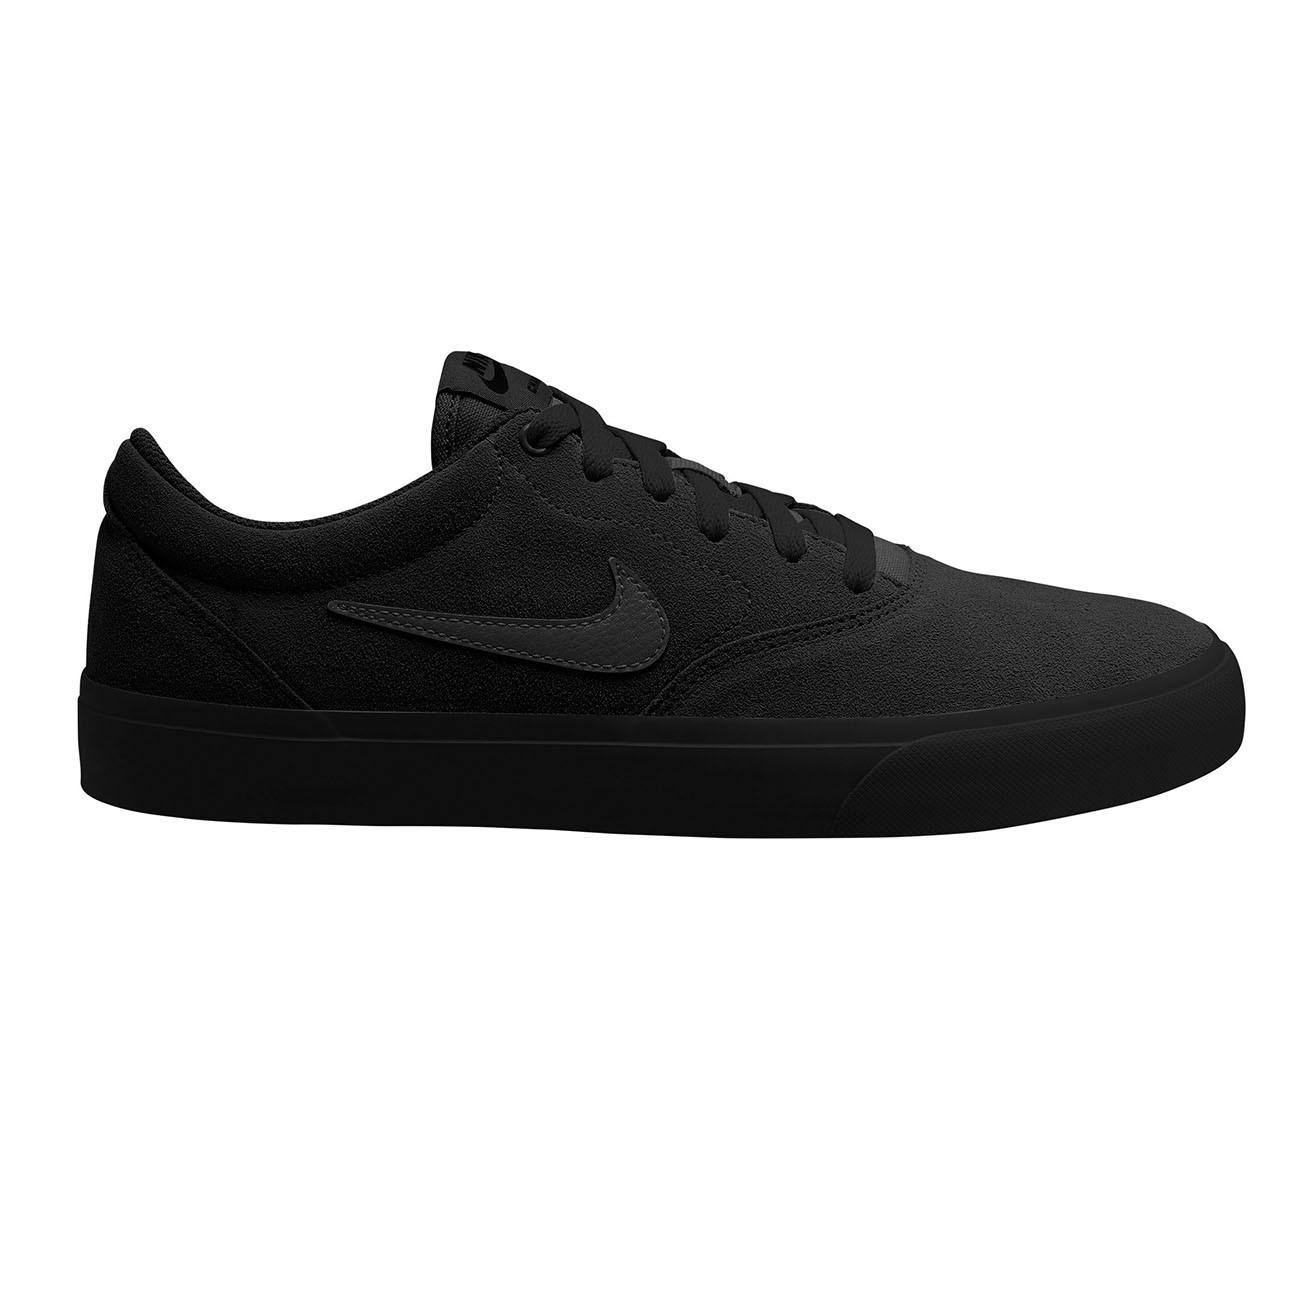 Sneakers Nike SB Charge Suede black